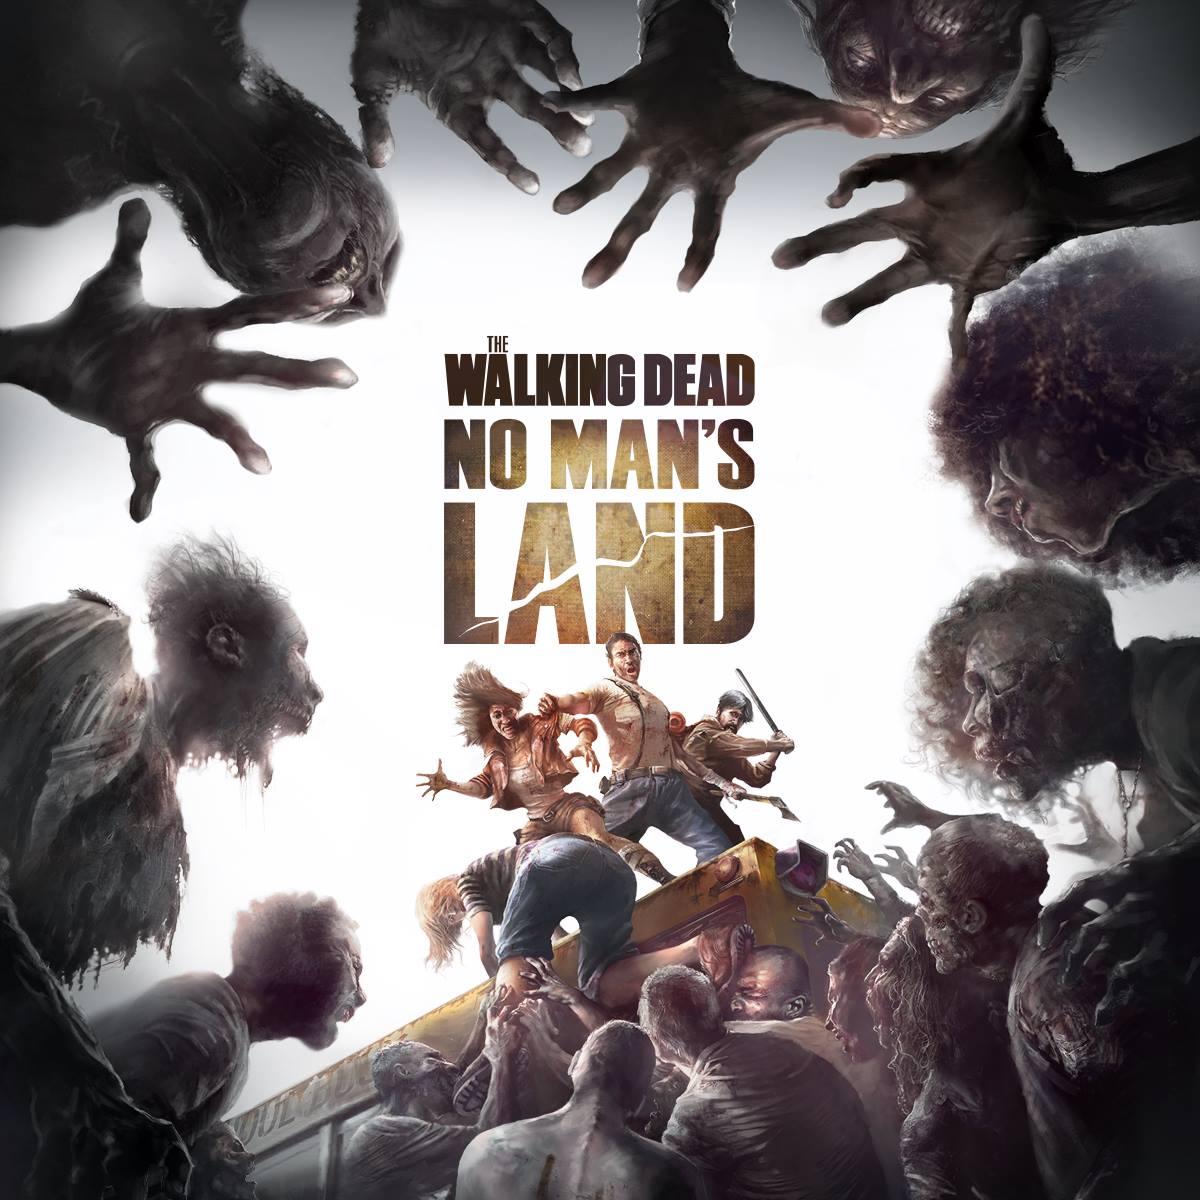 The Walking Dead: No Man's Land (Video Game 2015) - IMDb